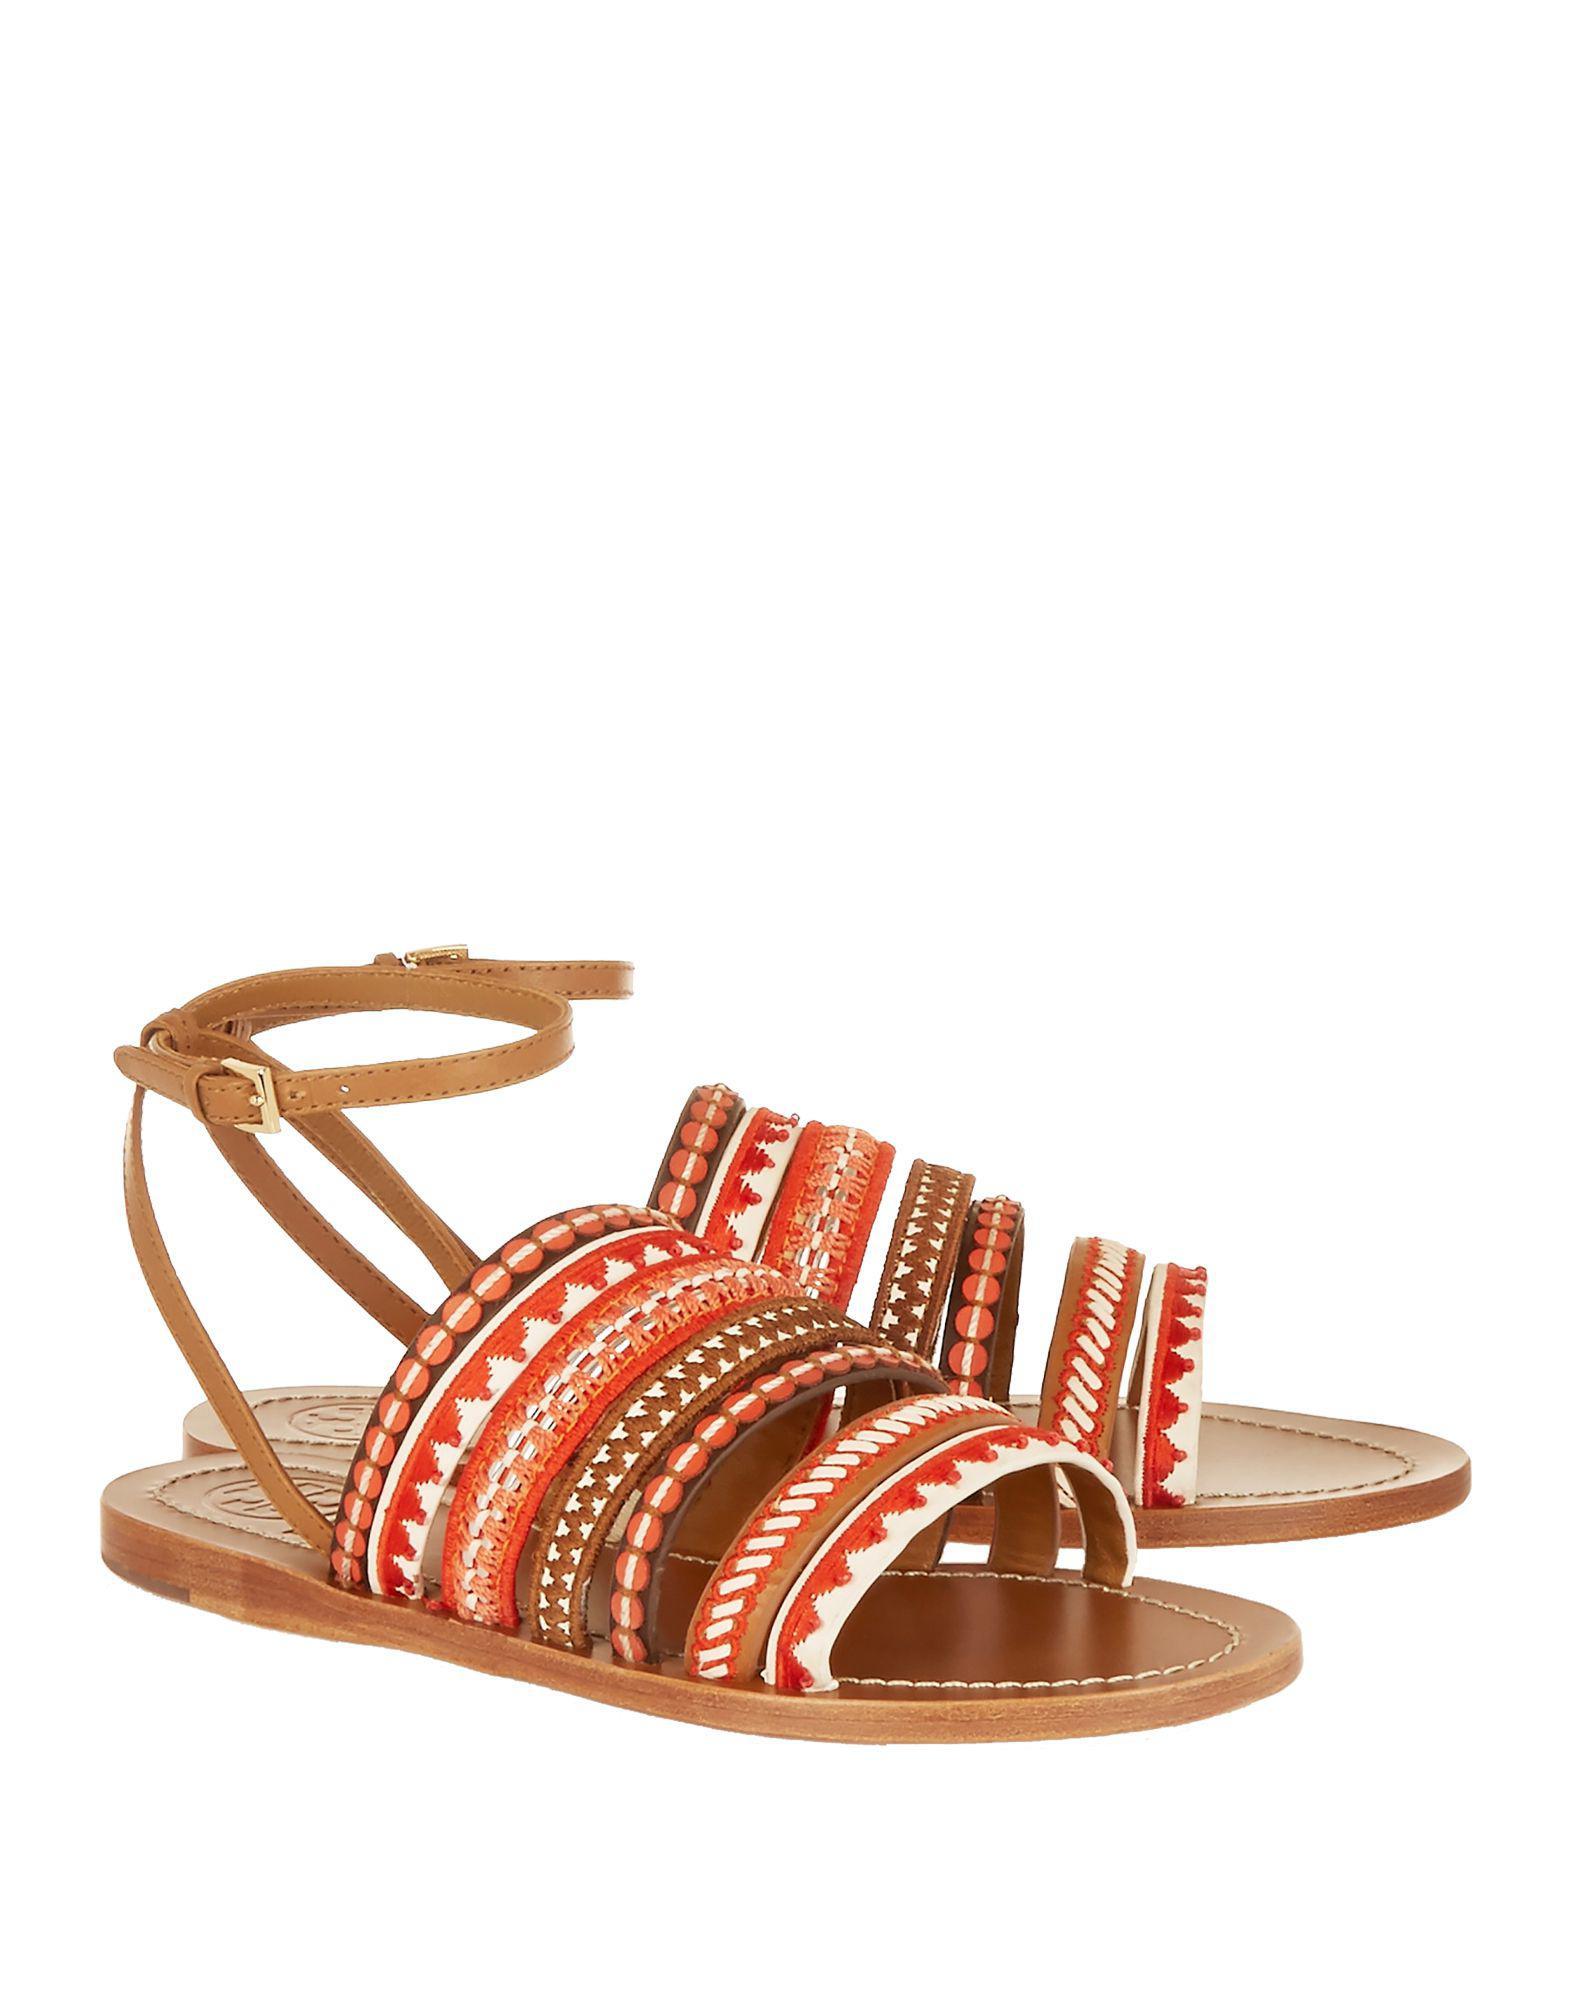 11966614f90 Lyst - Tory Burch Sandals